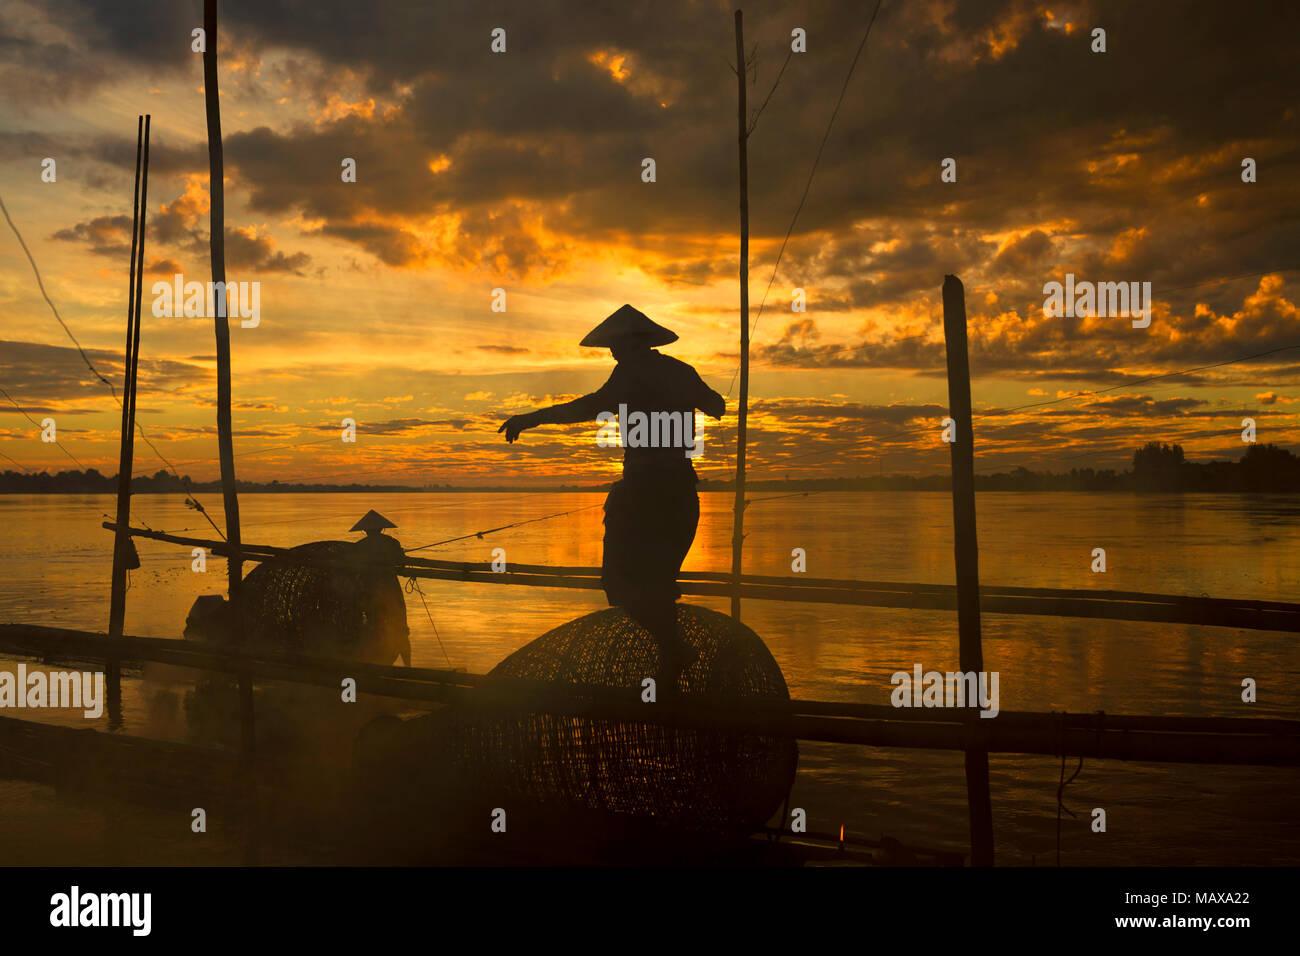 Fisherman lavorando sul fiume Mekong Immagini Stock